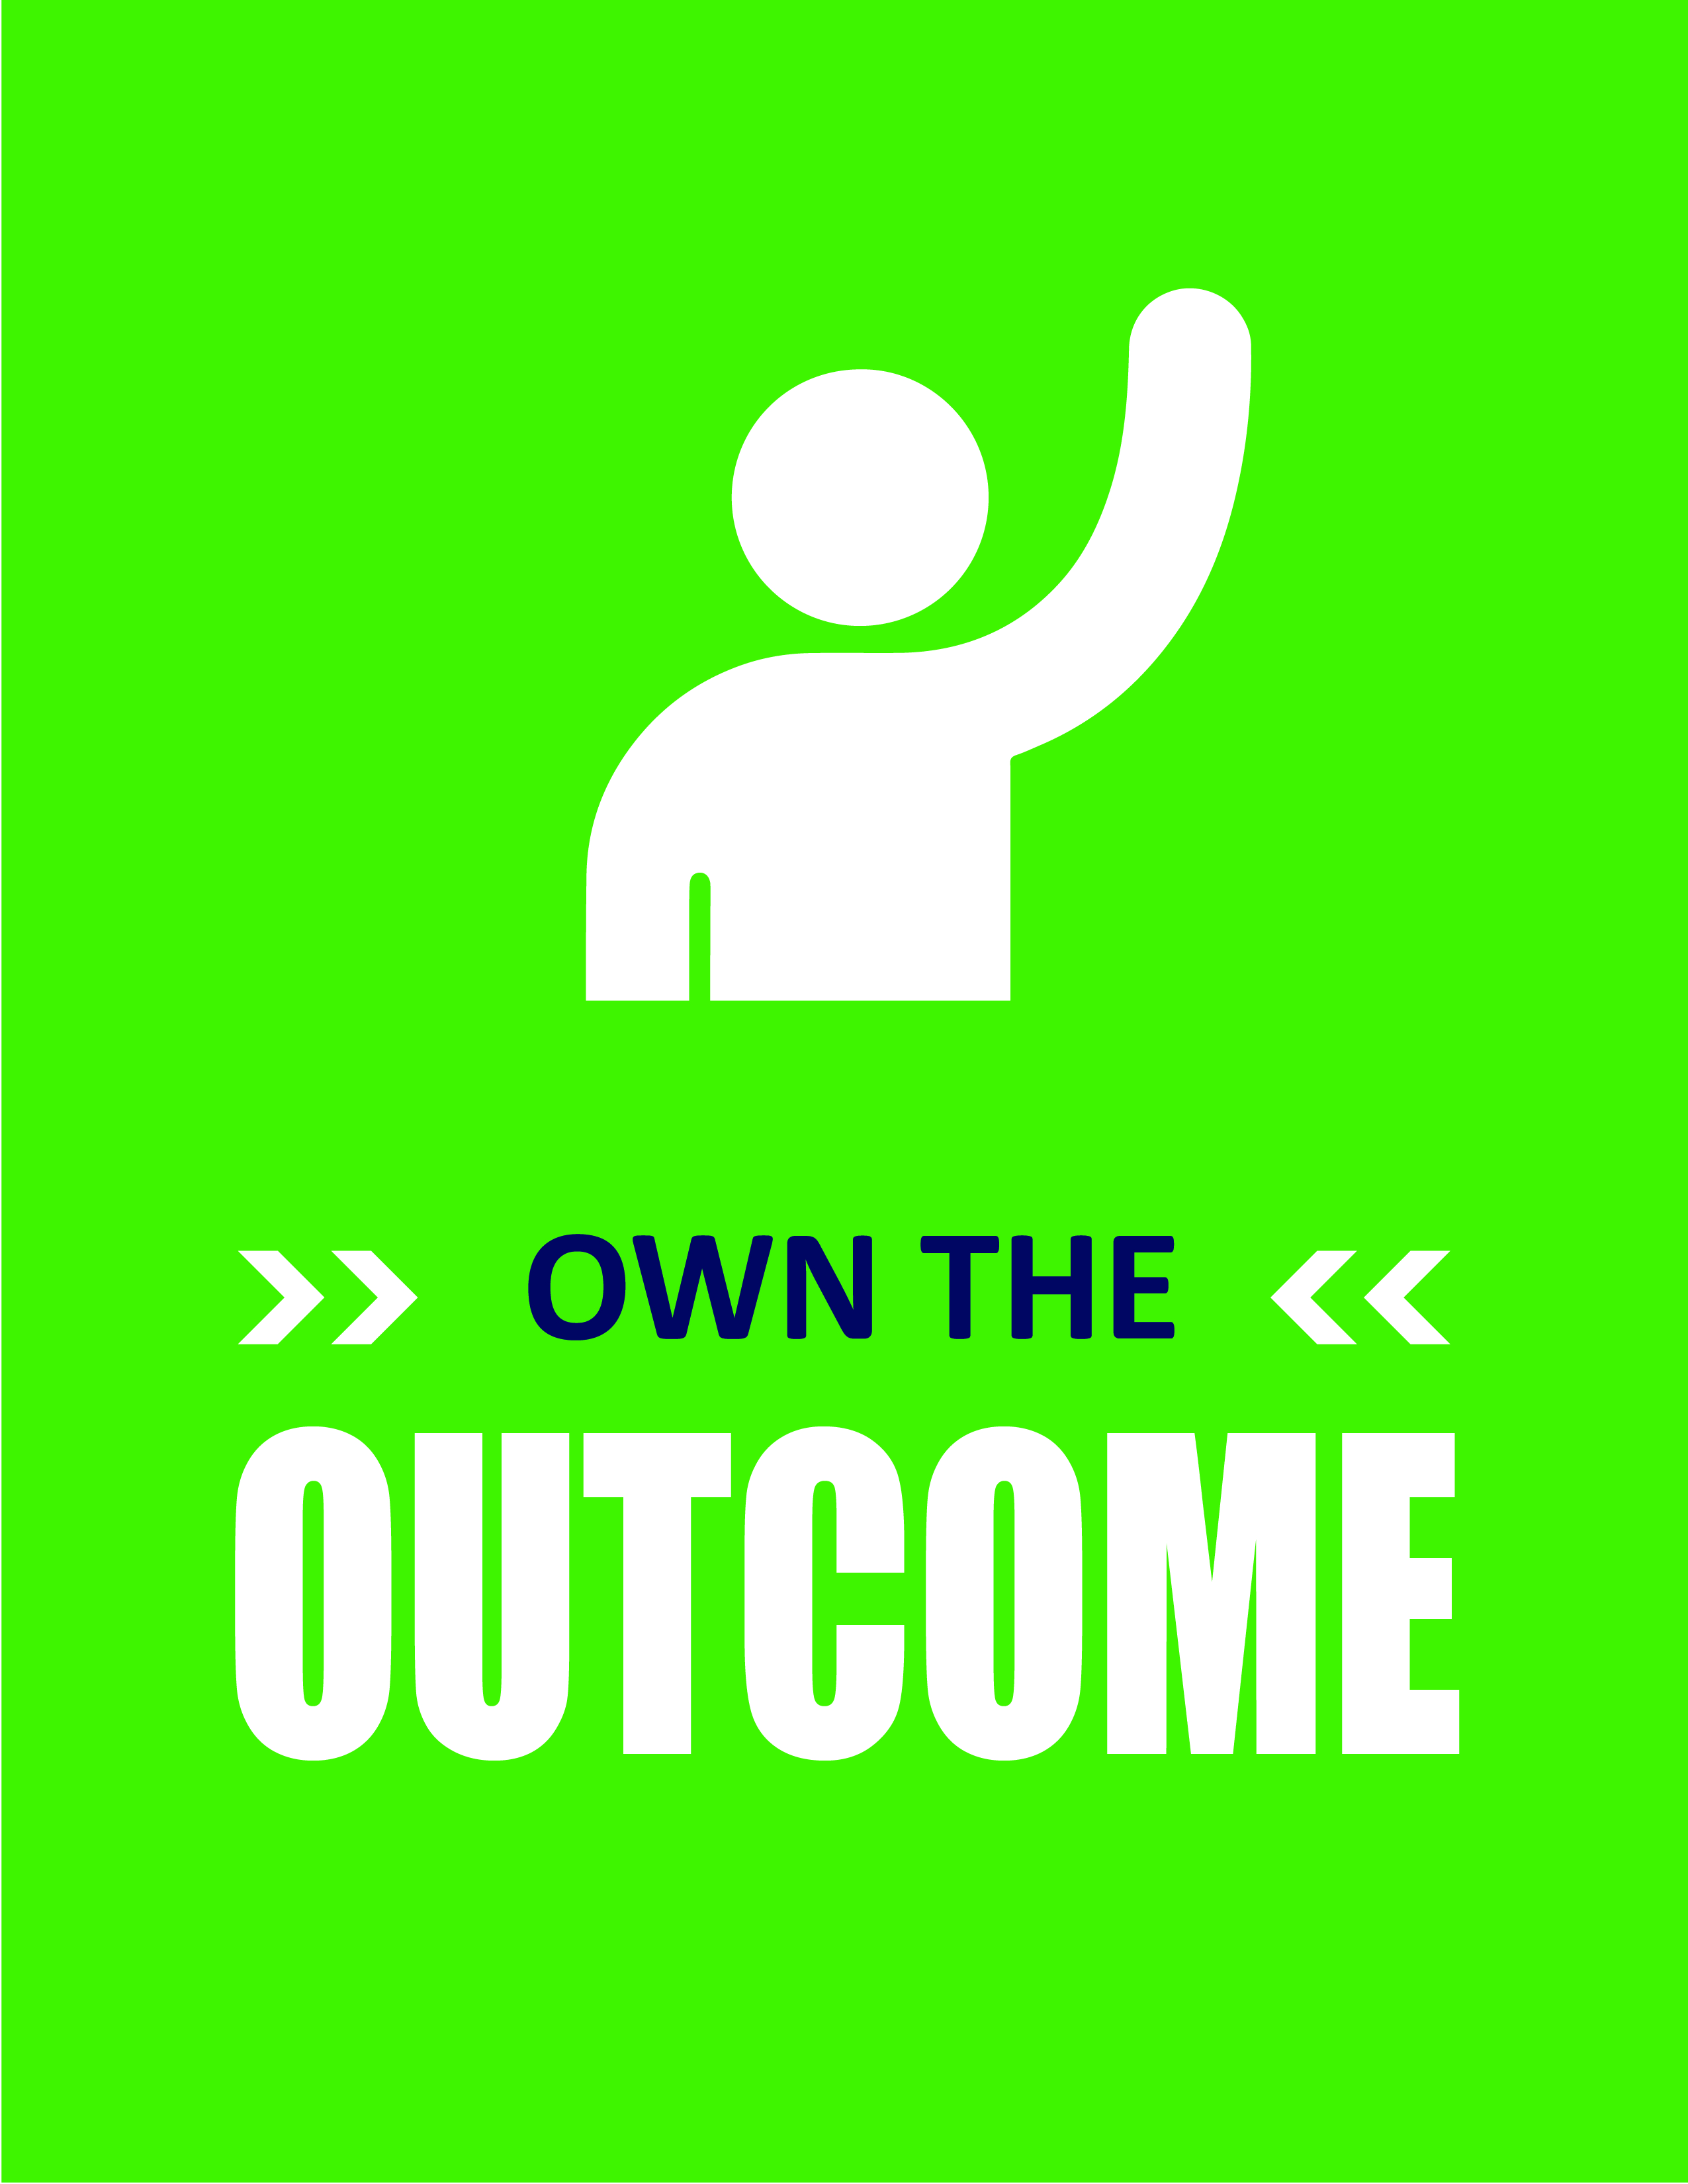 Own the Outcome